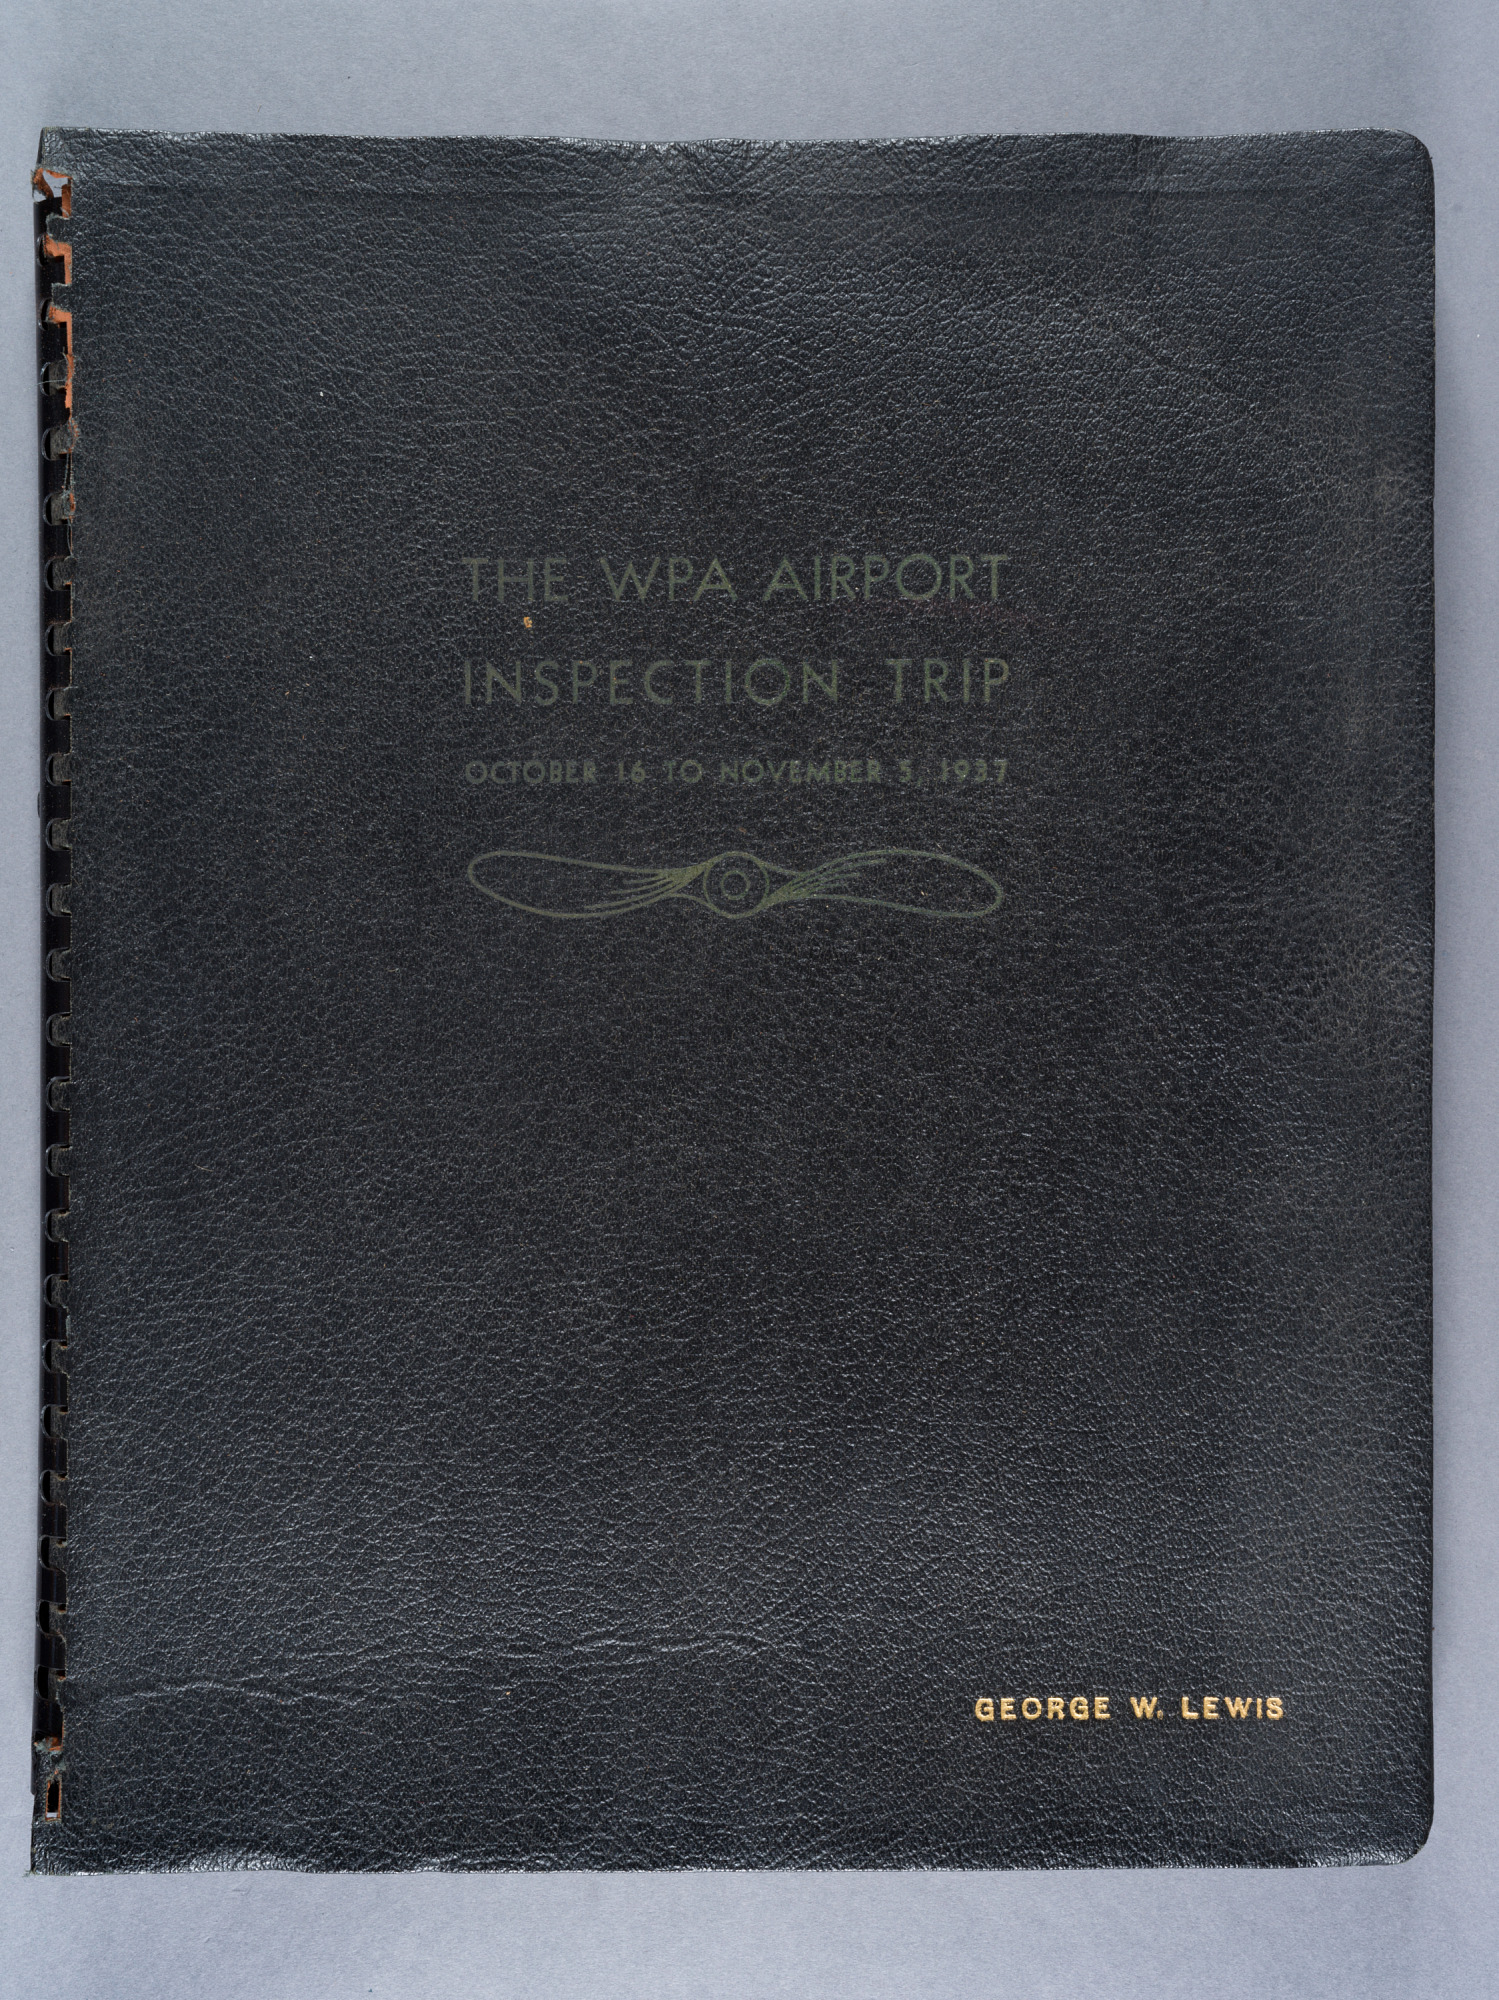 Works Progress Administration (WPA) Airport Inspection Scrapbook